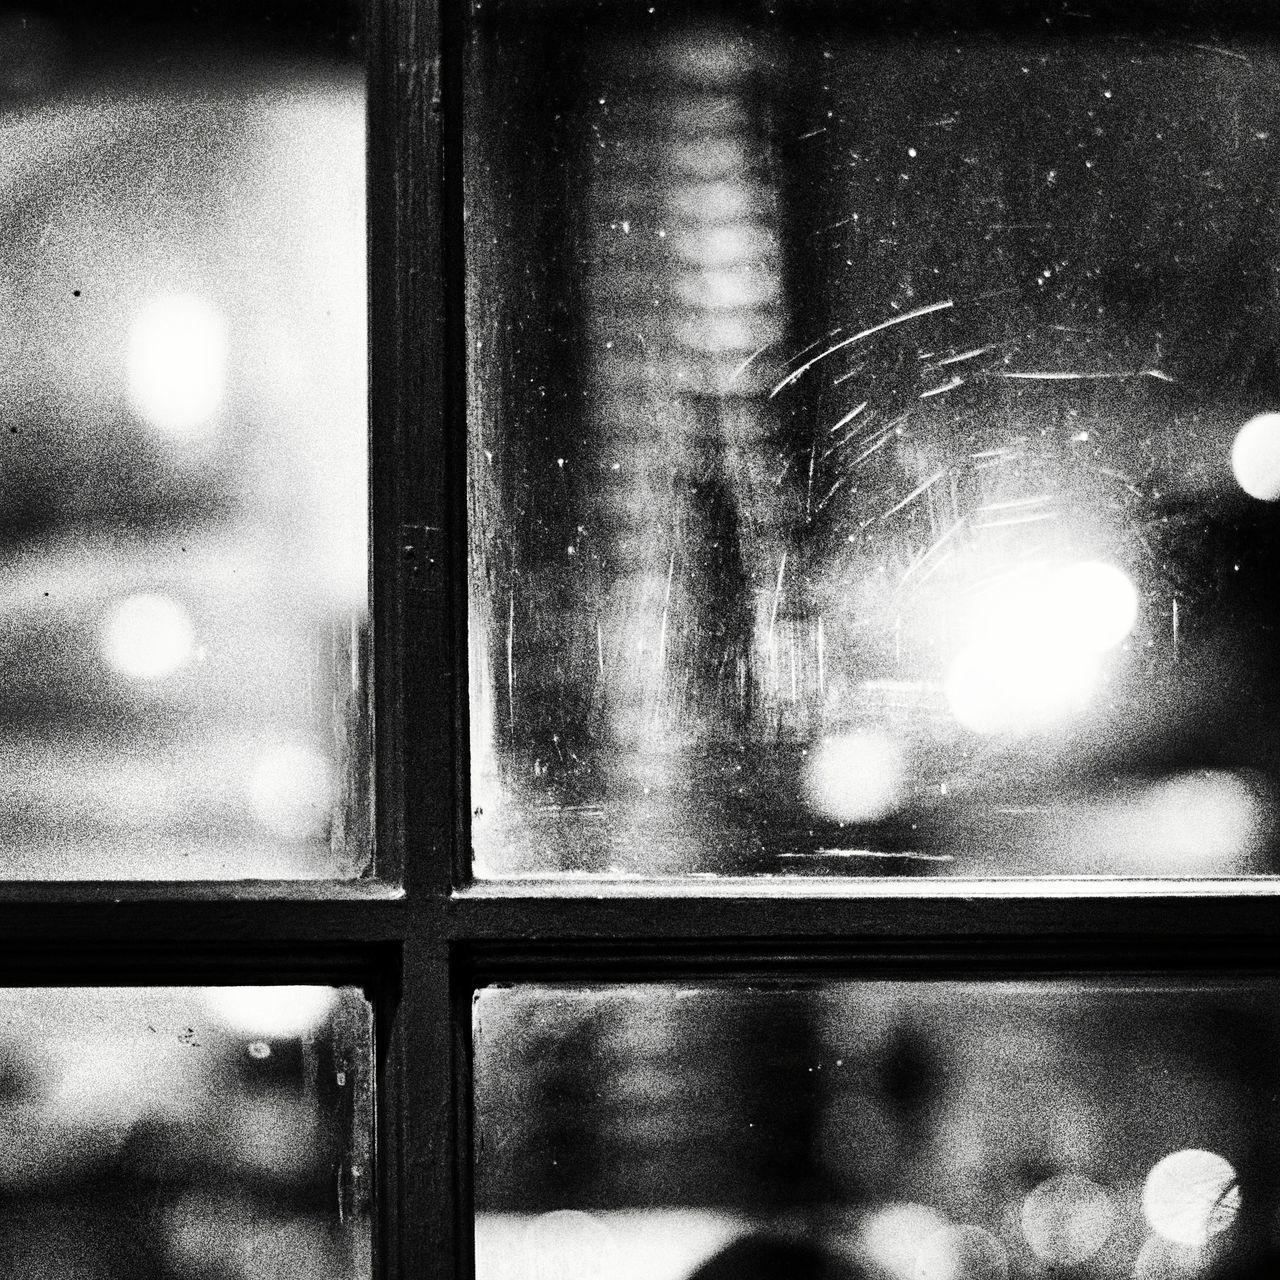 FULL FRAME SHOT OF ILLUMINATED WINDOW IN WATER